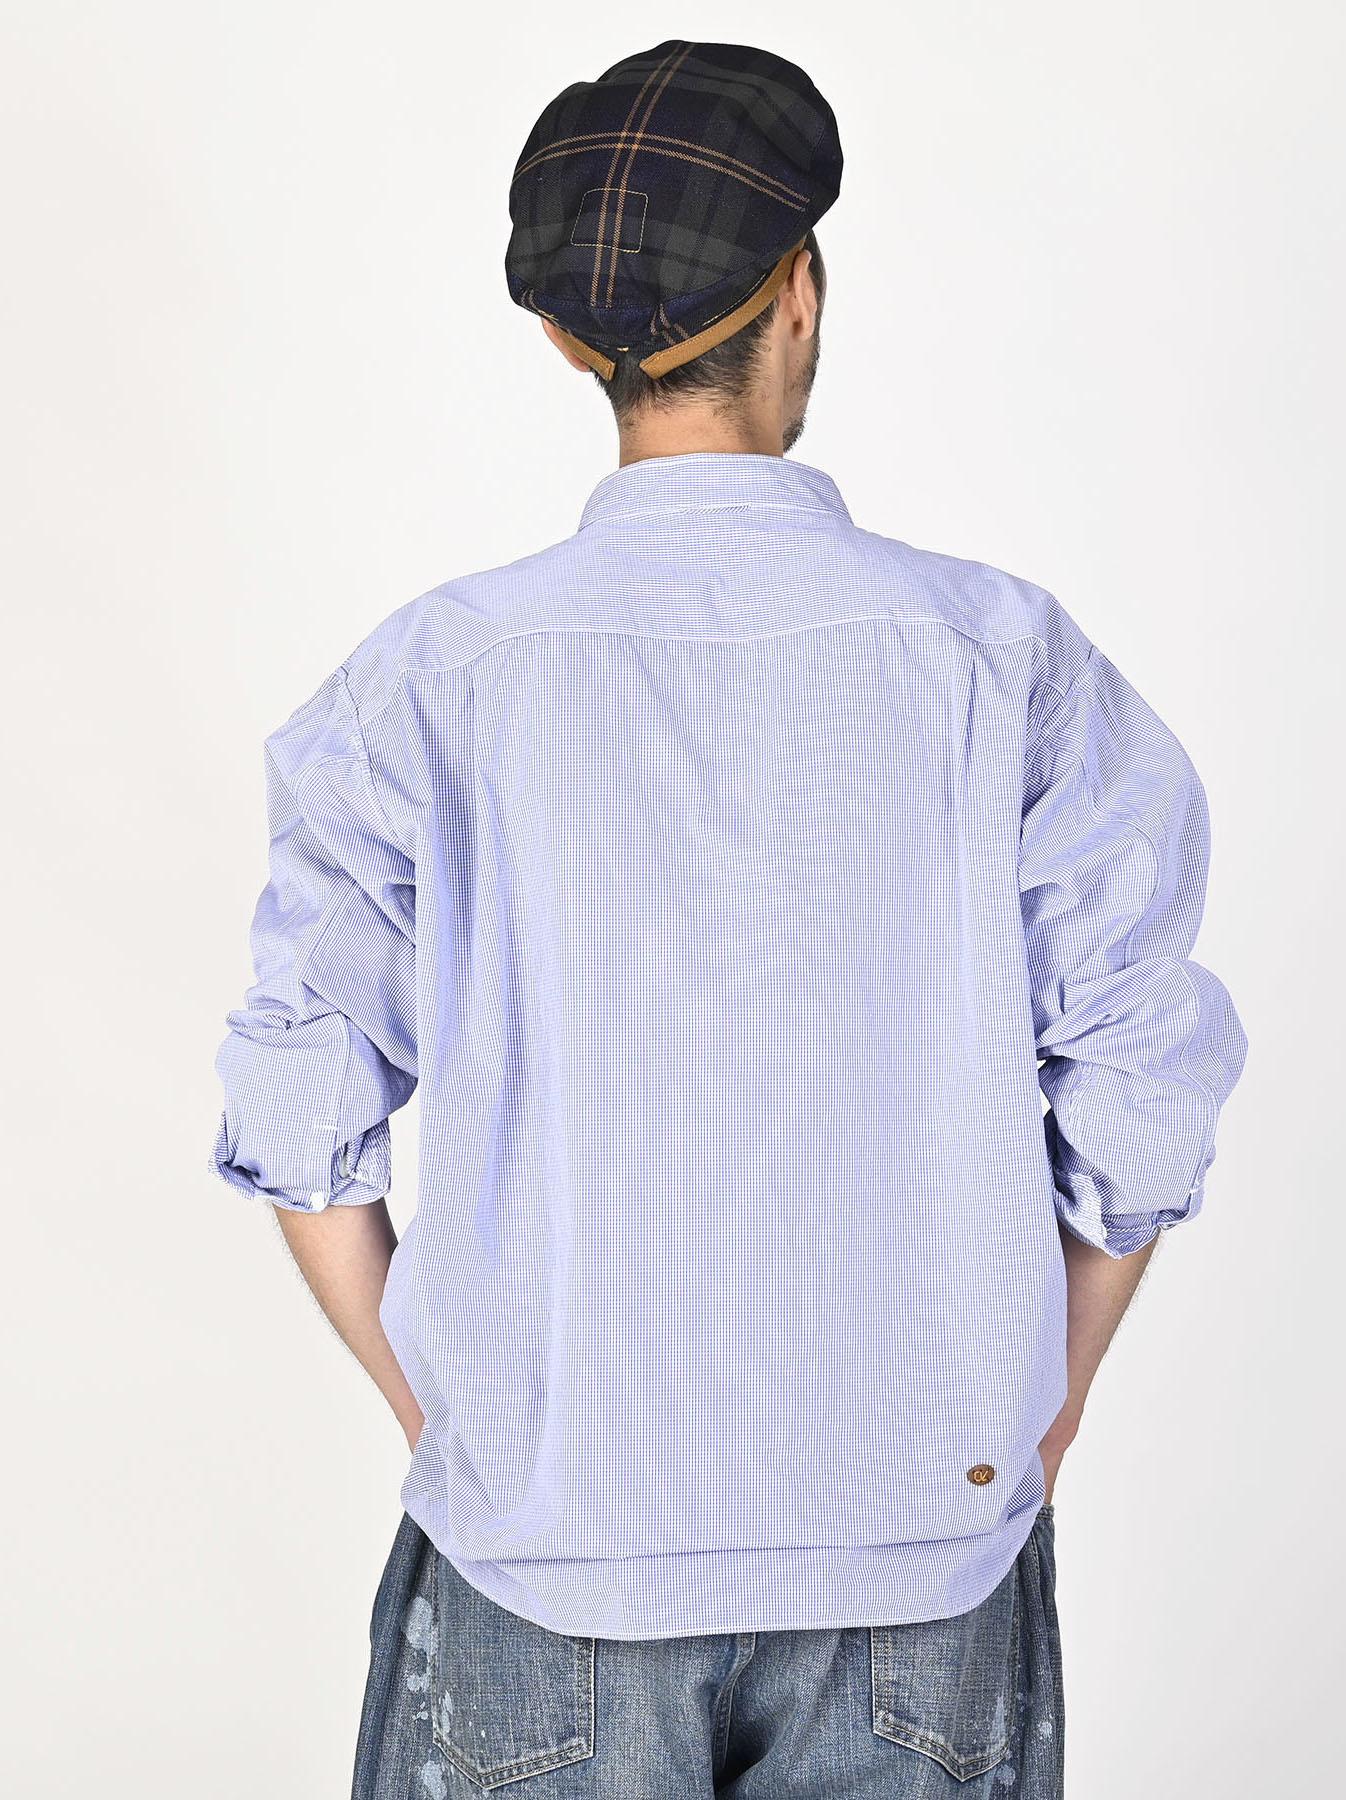 Miko Stand Collar 908 Ocean Shirt-7